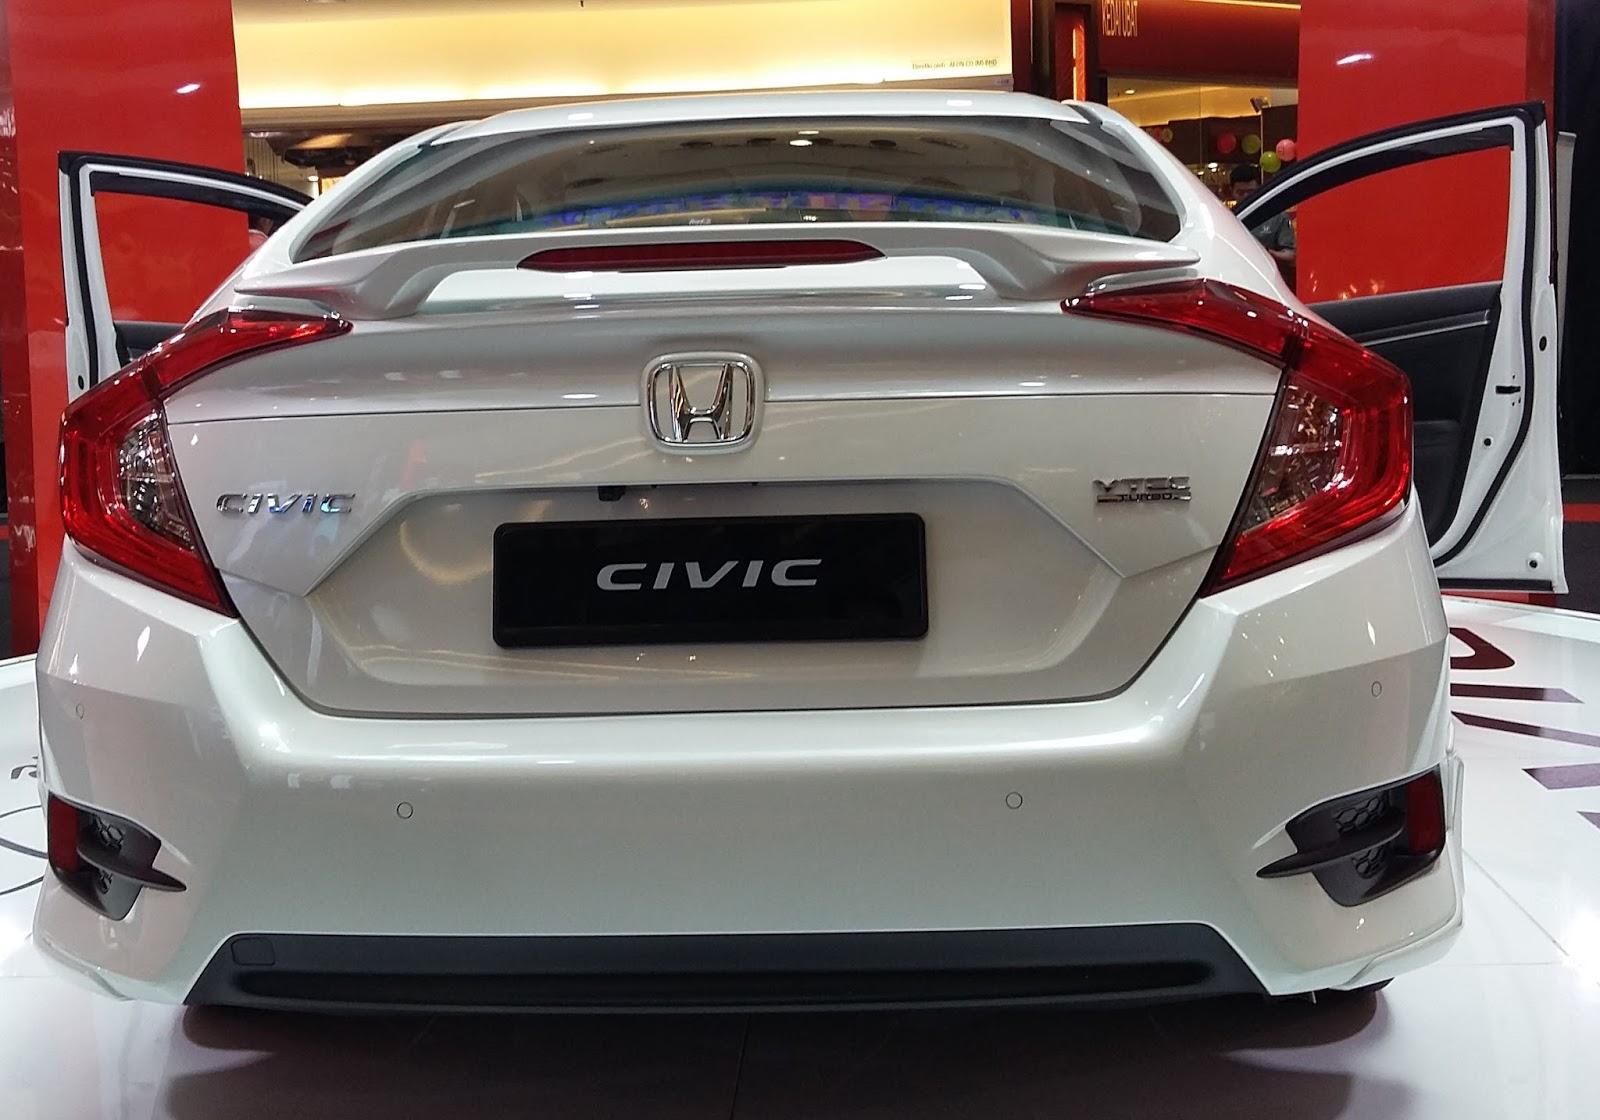 The layman auto all new honda civic the altis killer for Different honda civic models